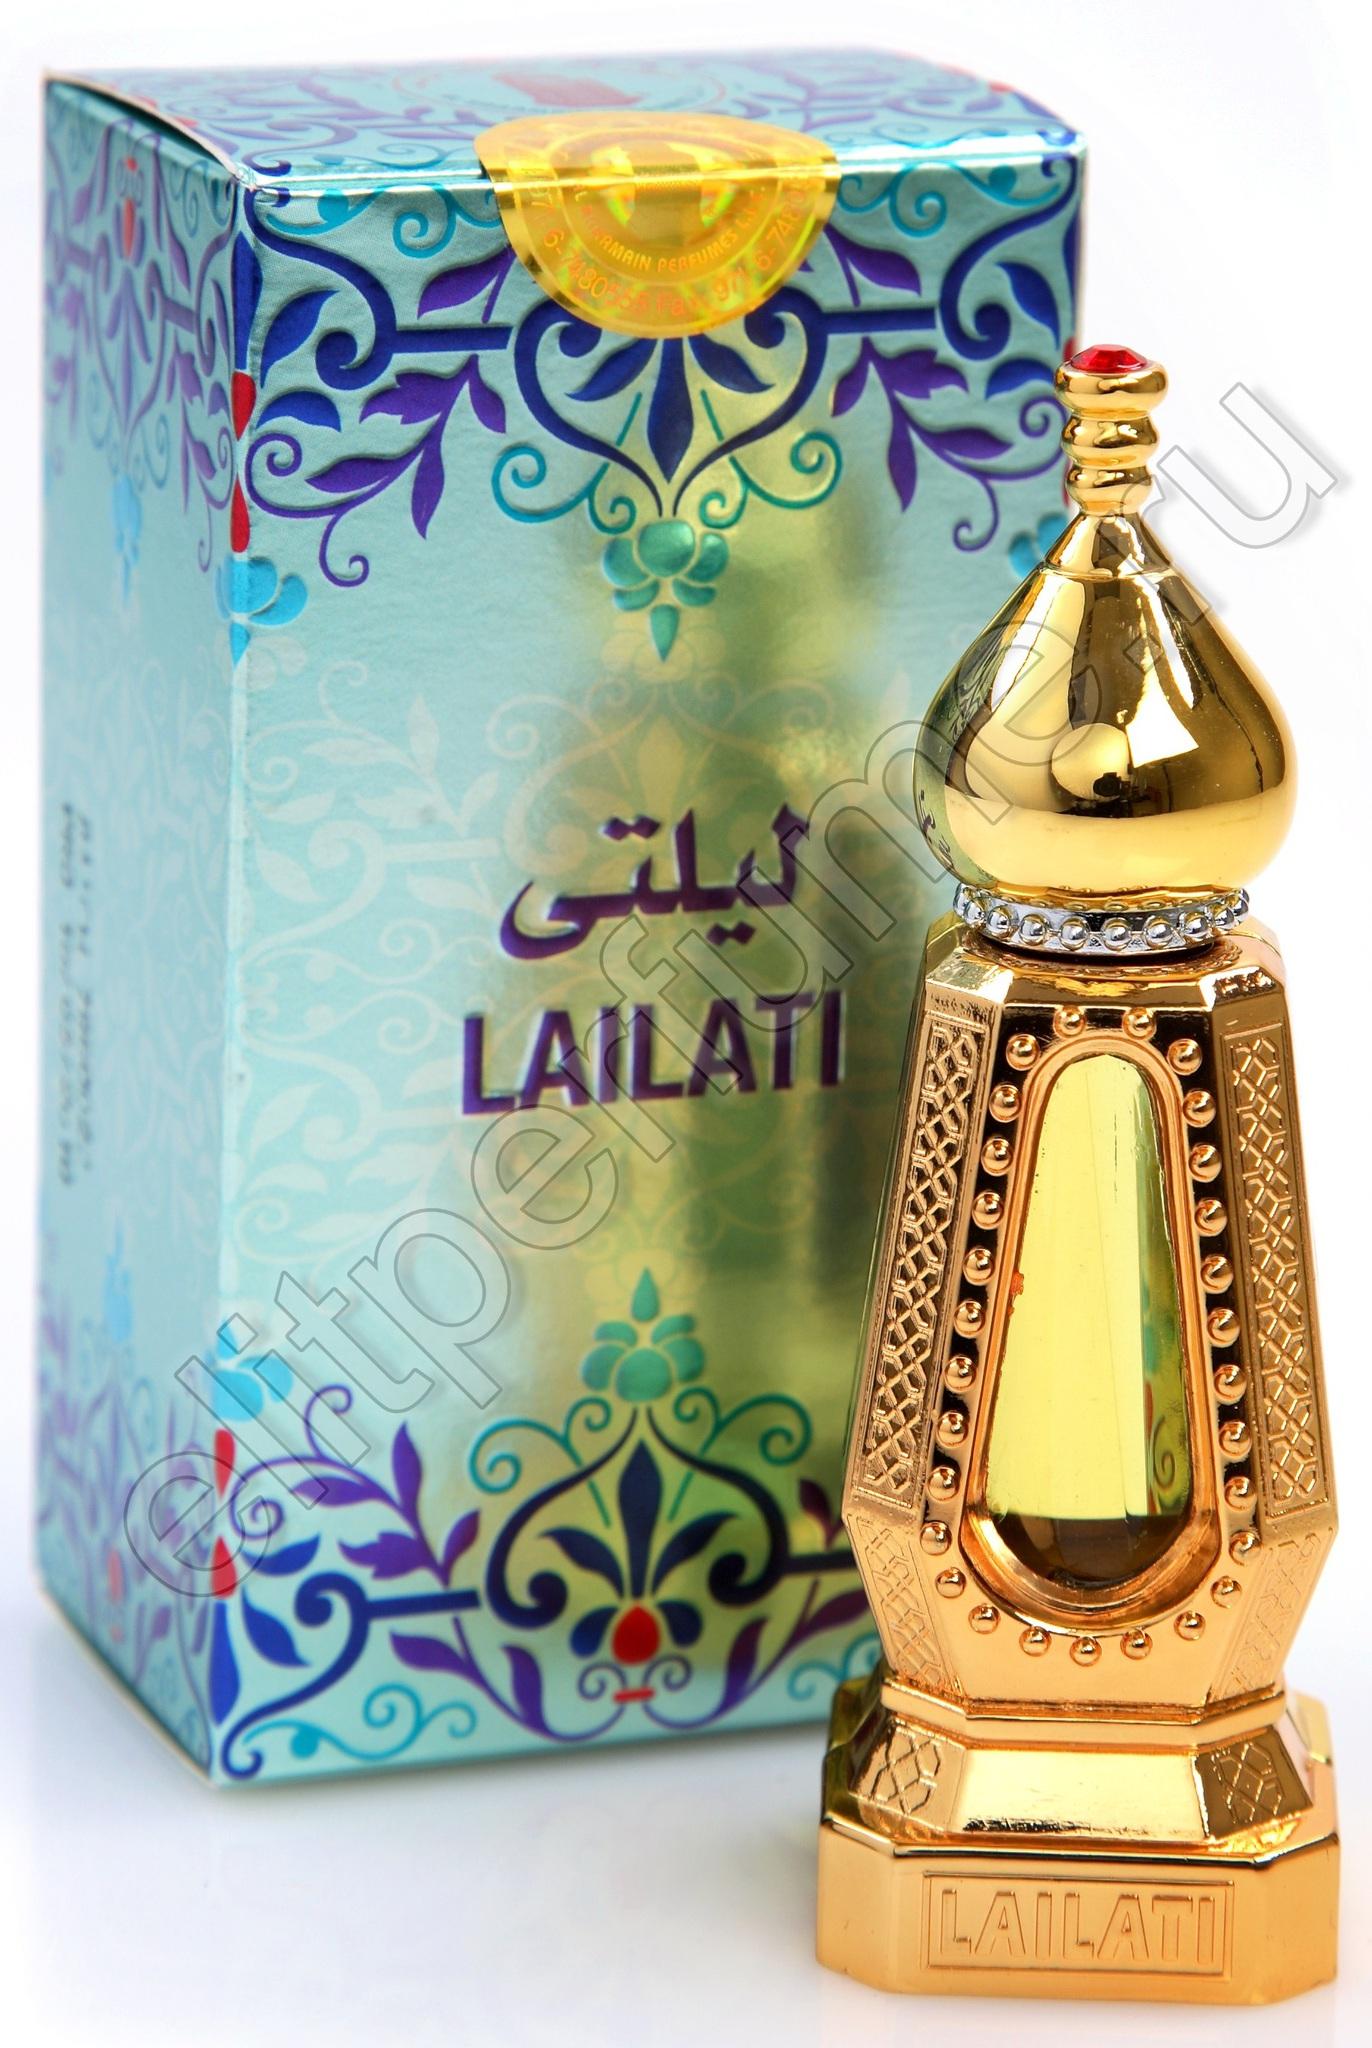 Лайлати Lailati 12 мл арабские масляные духи от Аль Харамайн Al Haramain Perfumes